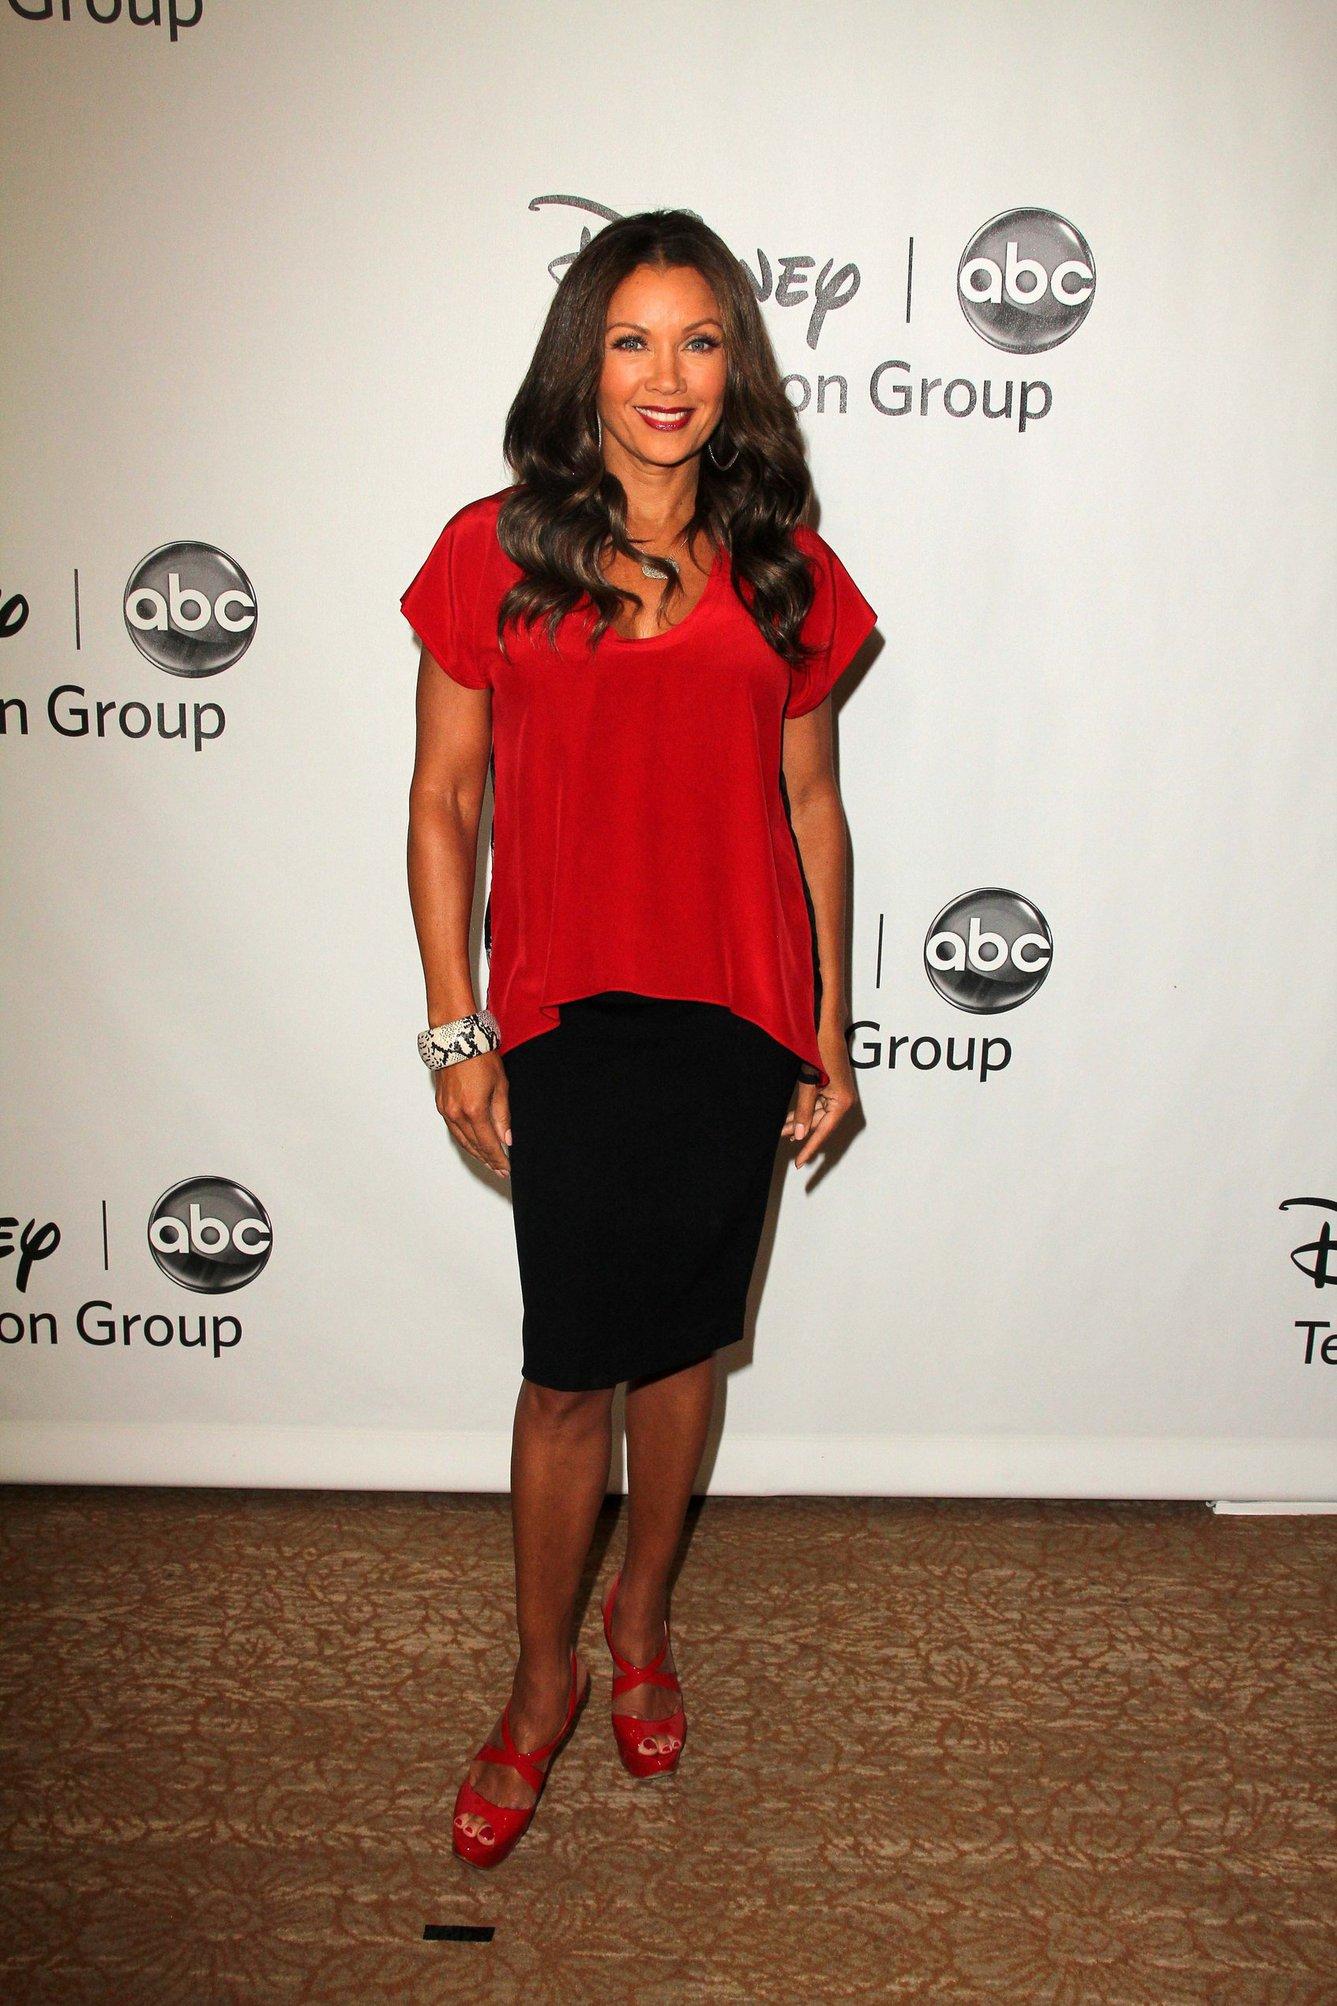 Vanessa Williams - 2012 TCA Summer Press Tour - Disney ABC Television Group Party (July 27, 2012)